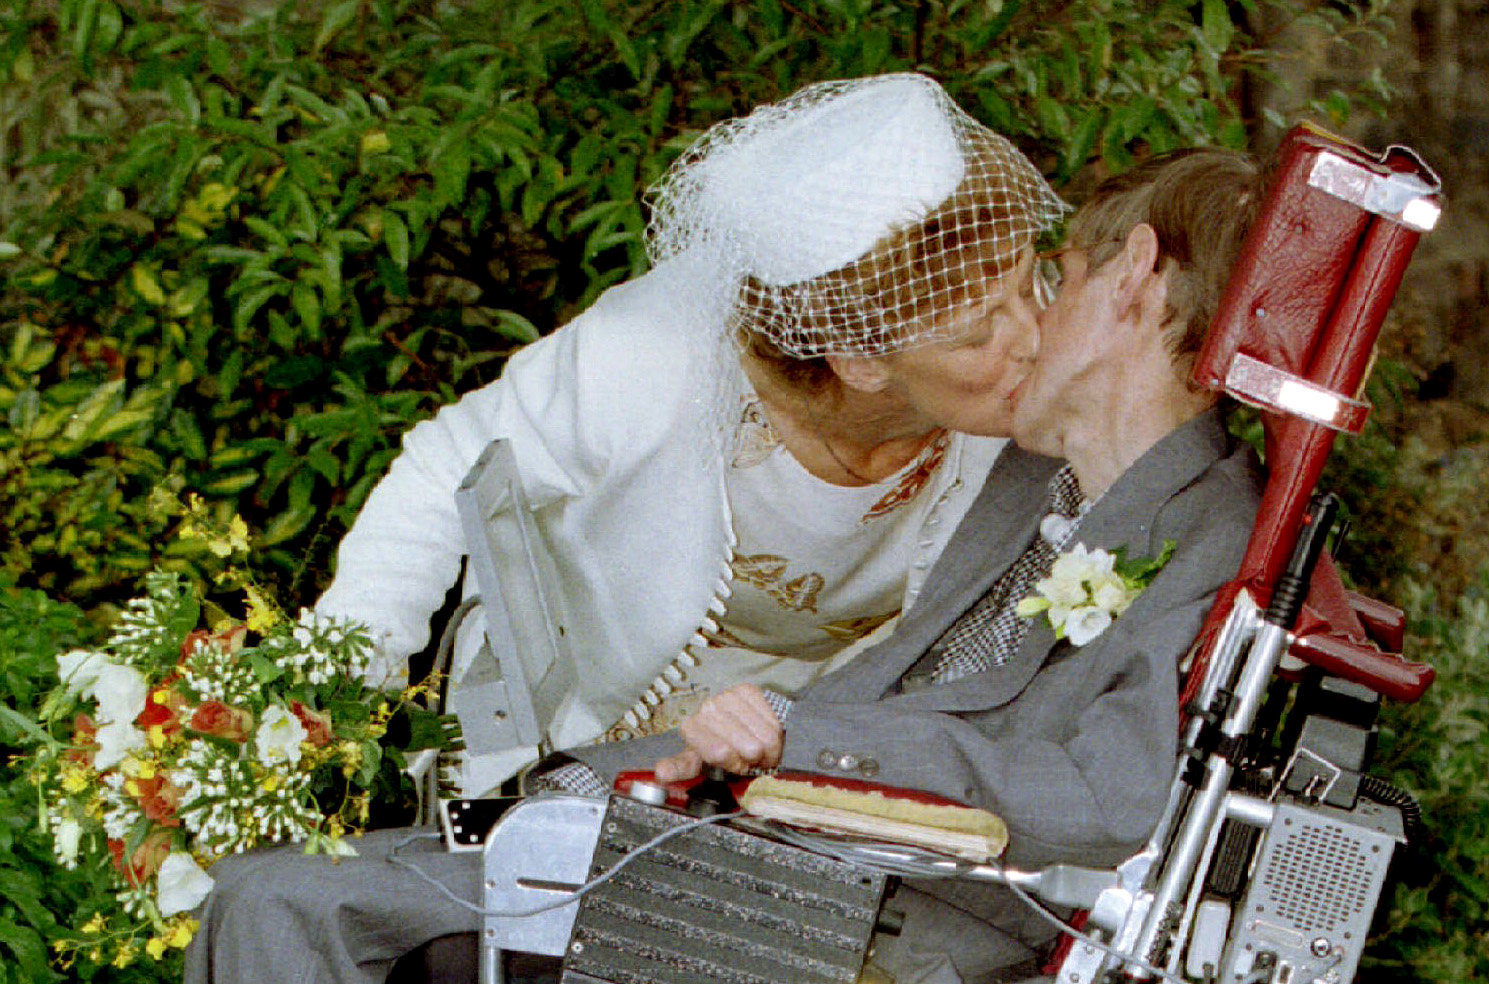 Con su segunda esposa Elaine Mason en 2012 (REUTERS/Paul Bates)